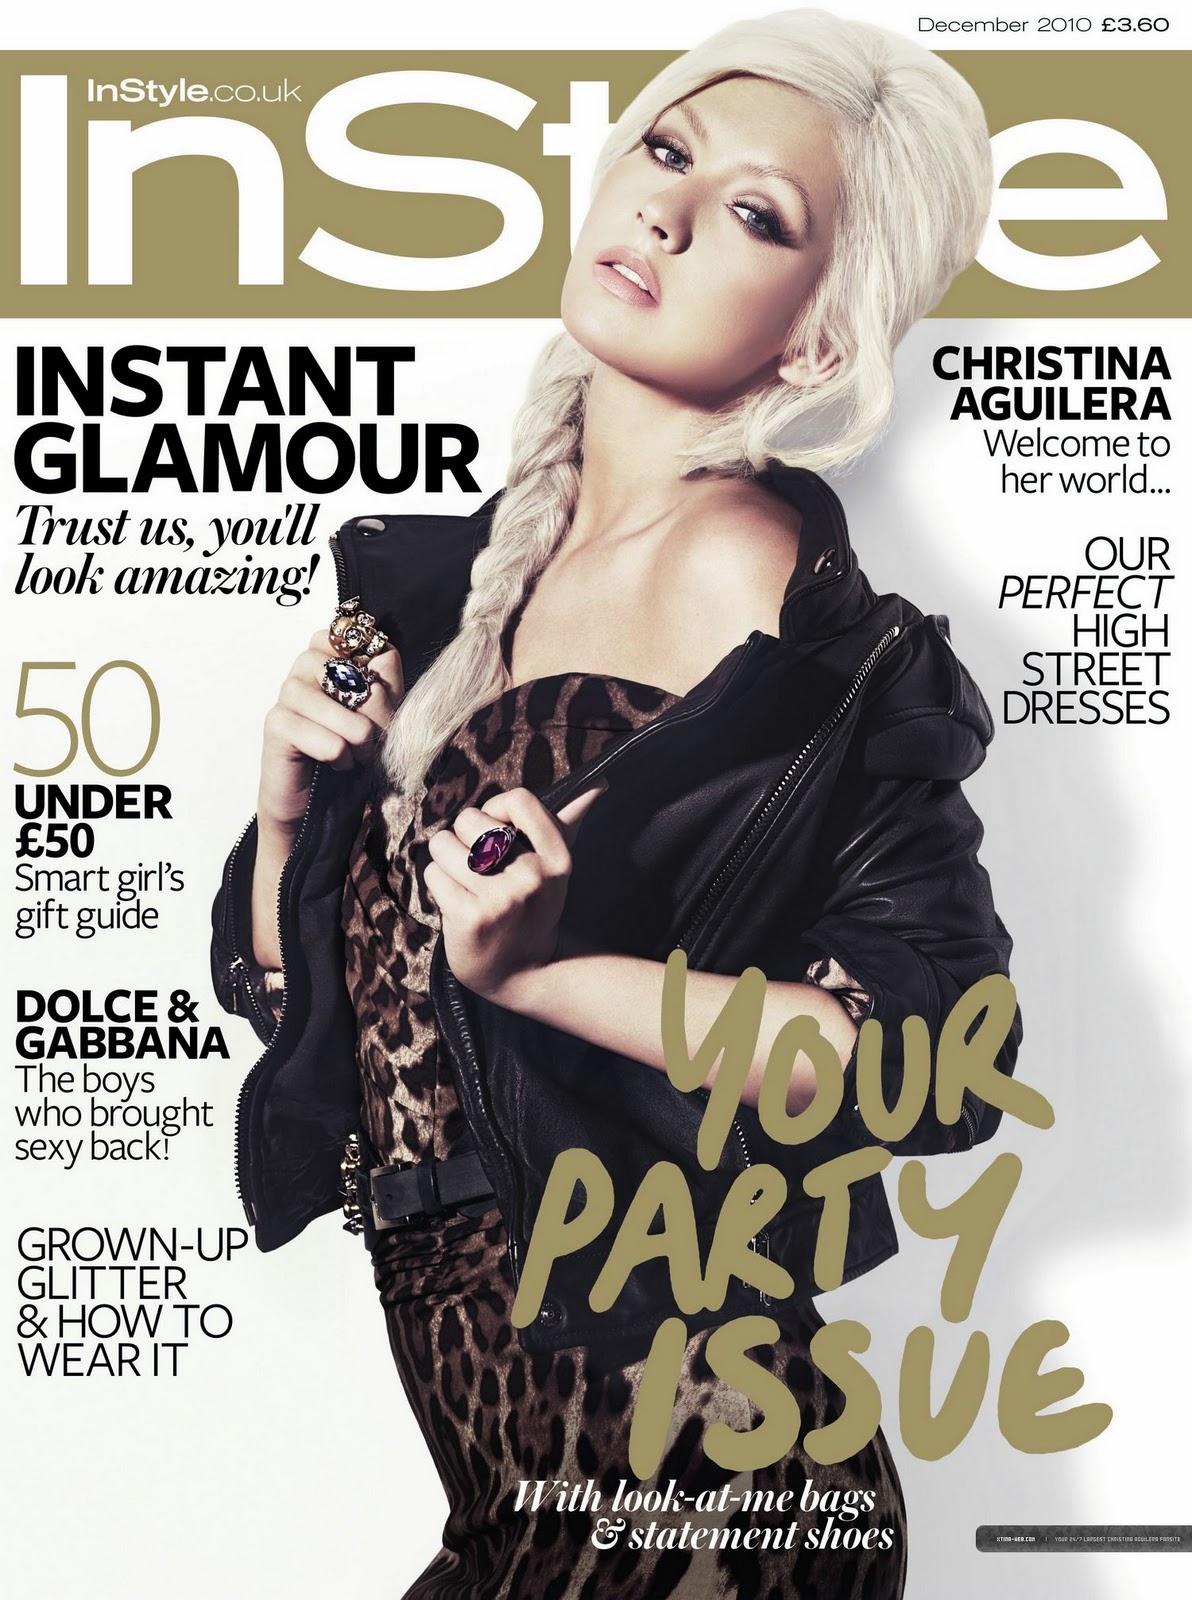 http://3.bp.blogspot.com/_QcYf_8sBCik/TNTVk35IJBI/AAAAAAAAHeM/5srkAggpeJ8/s1600/Christina+Aguilera+InStyle+UK+Magazine+December+2010.jpg